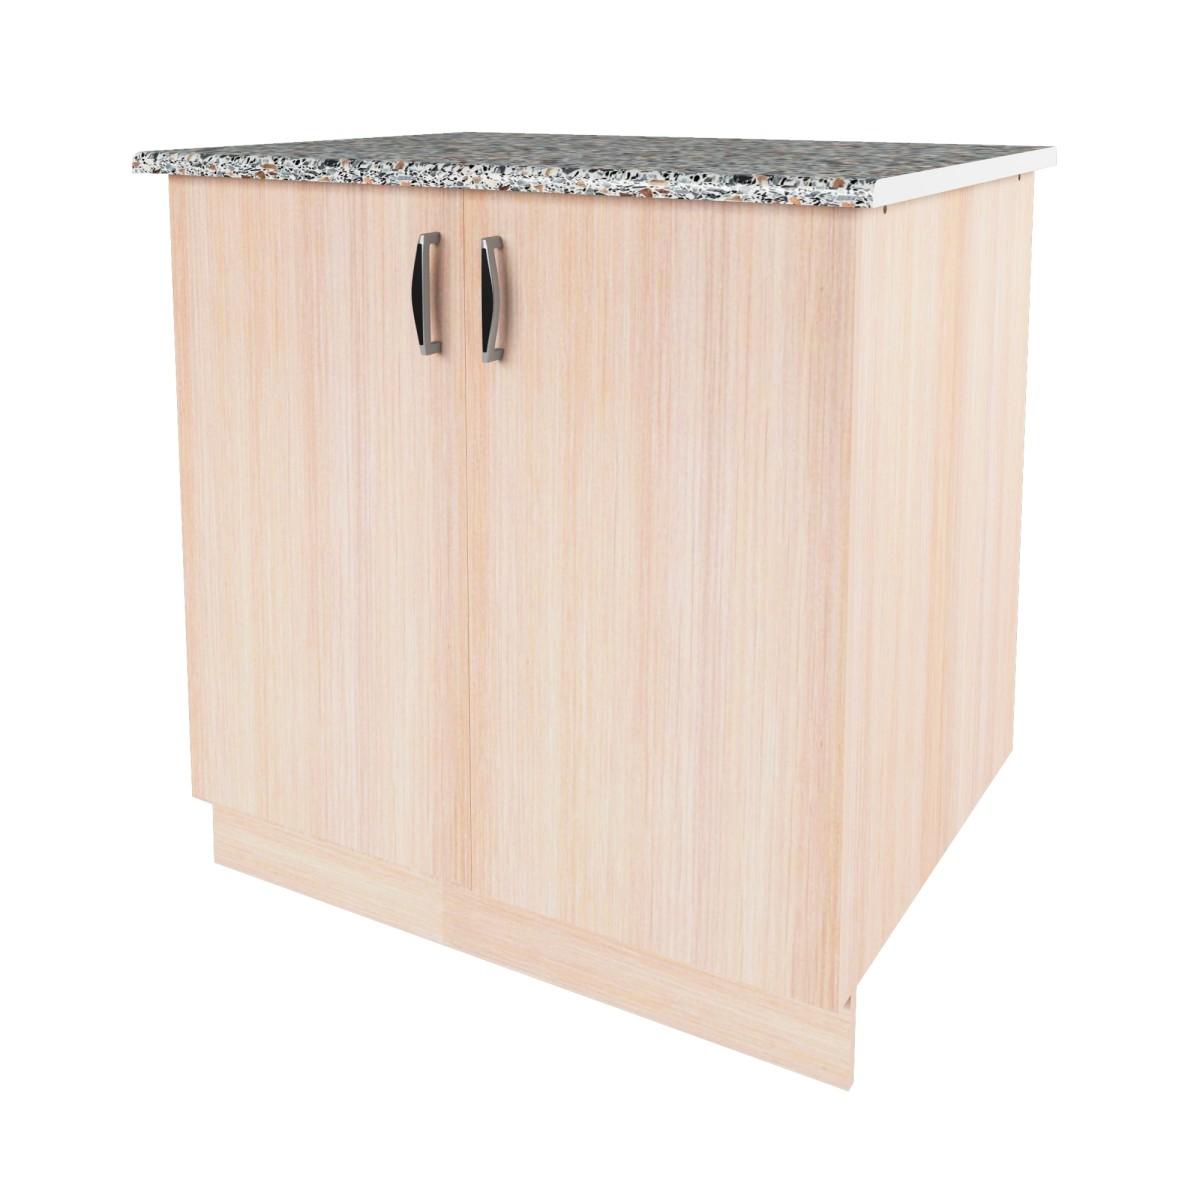 Шкаф напольный Дуб Молочный Д 86х80 см цвет дуб